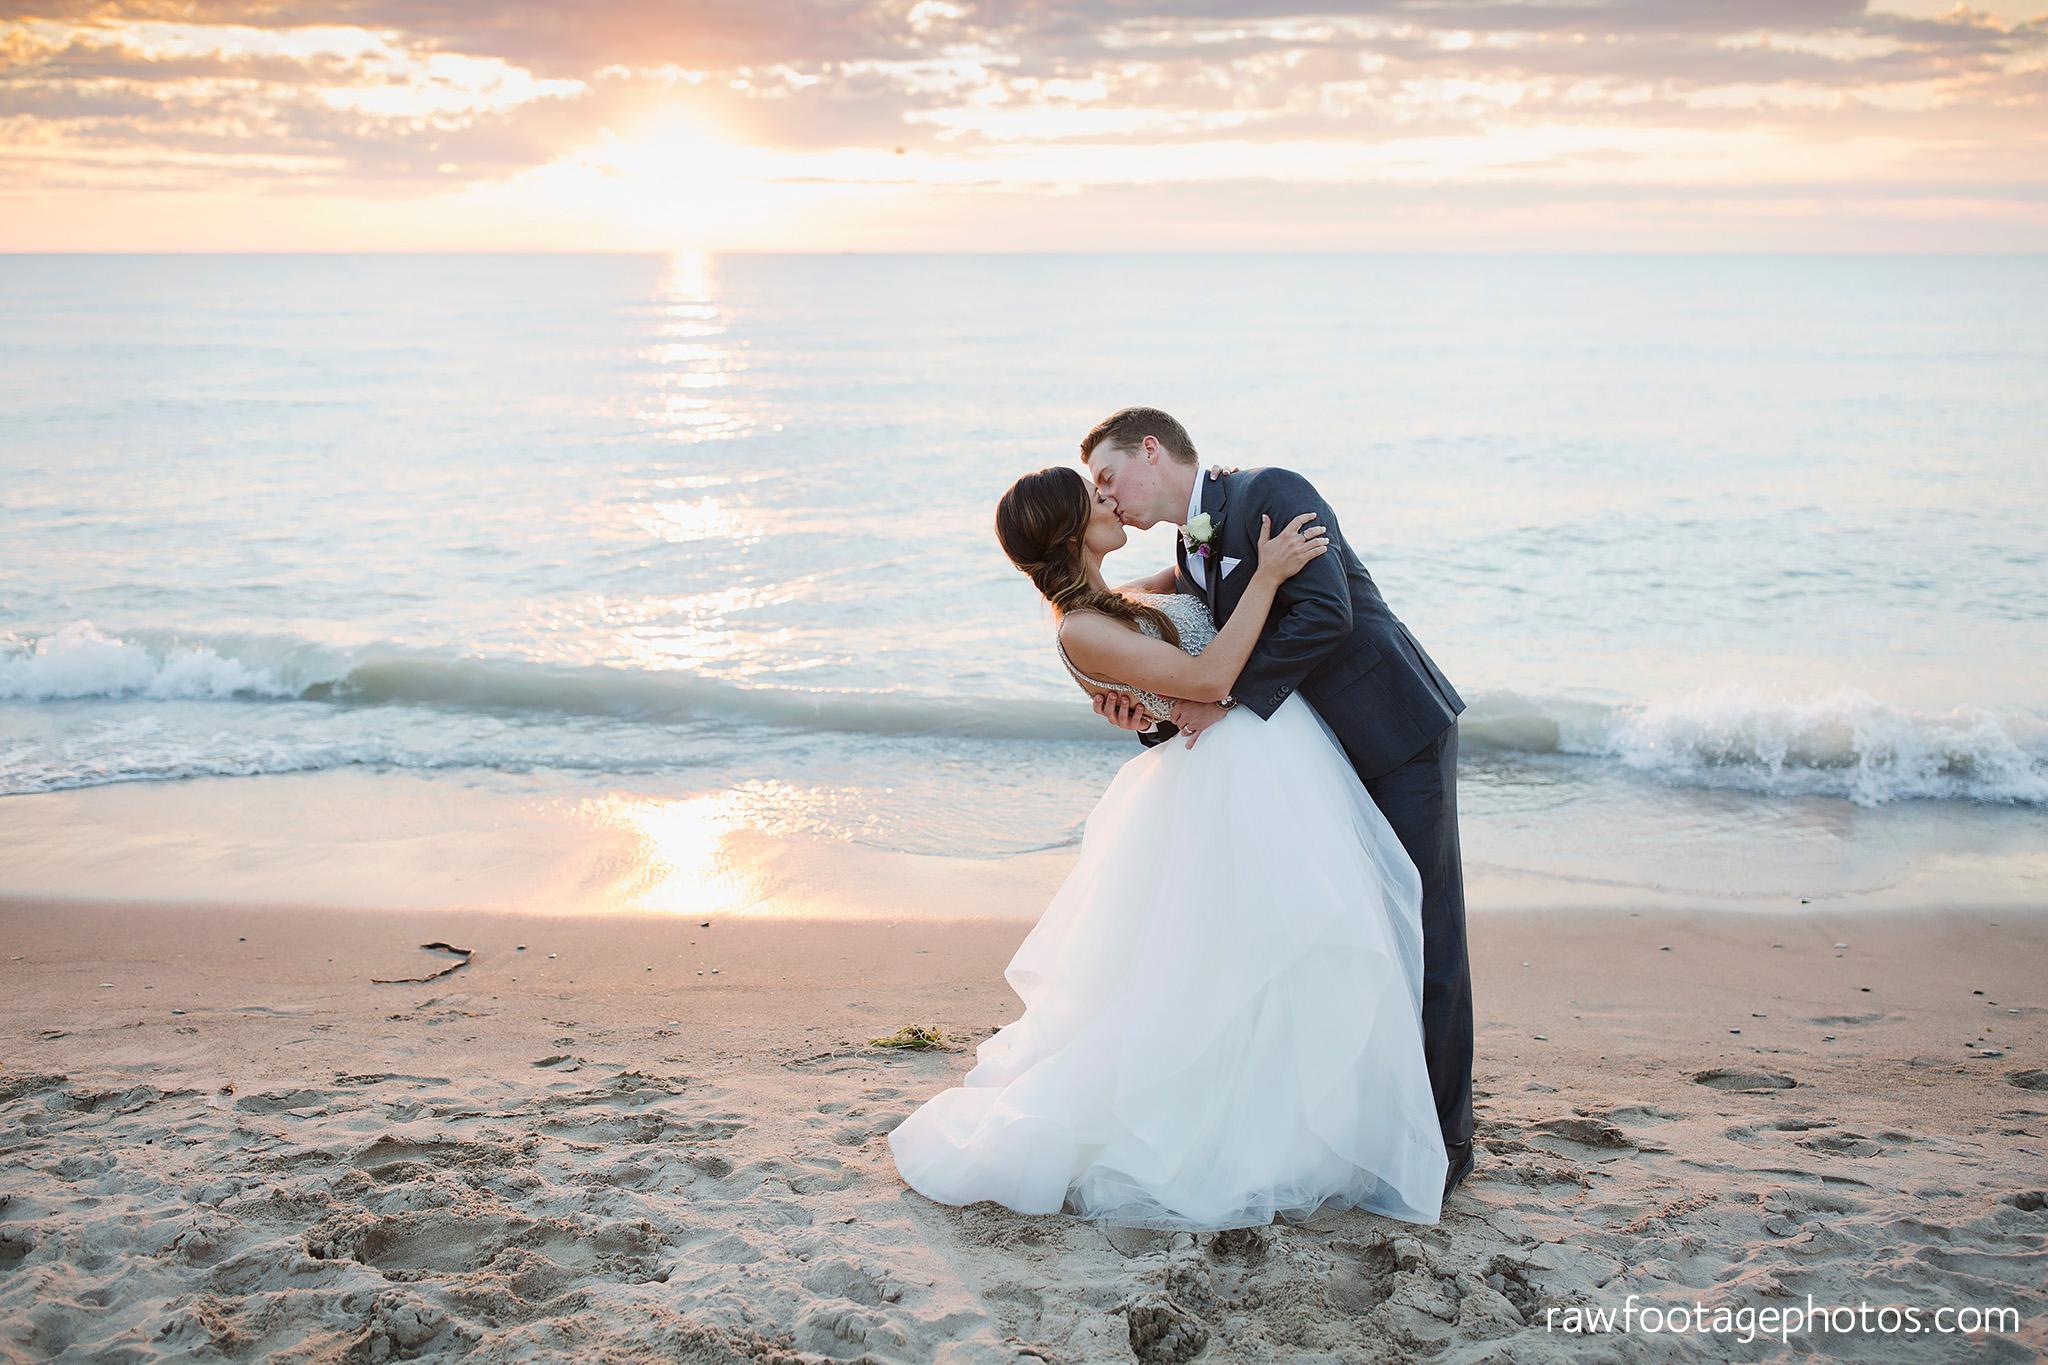 london_ontario_wedding_photographer-grand_bend_wedding_photographer-oakwood_resort_wedding-beach_wedding-sunset_wedding-raw_footage_photography069.jpg